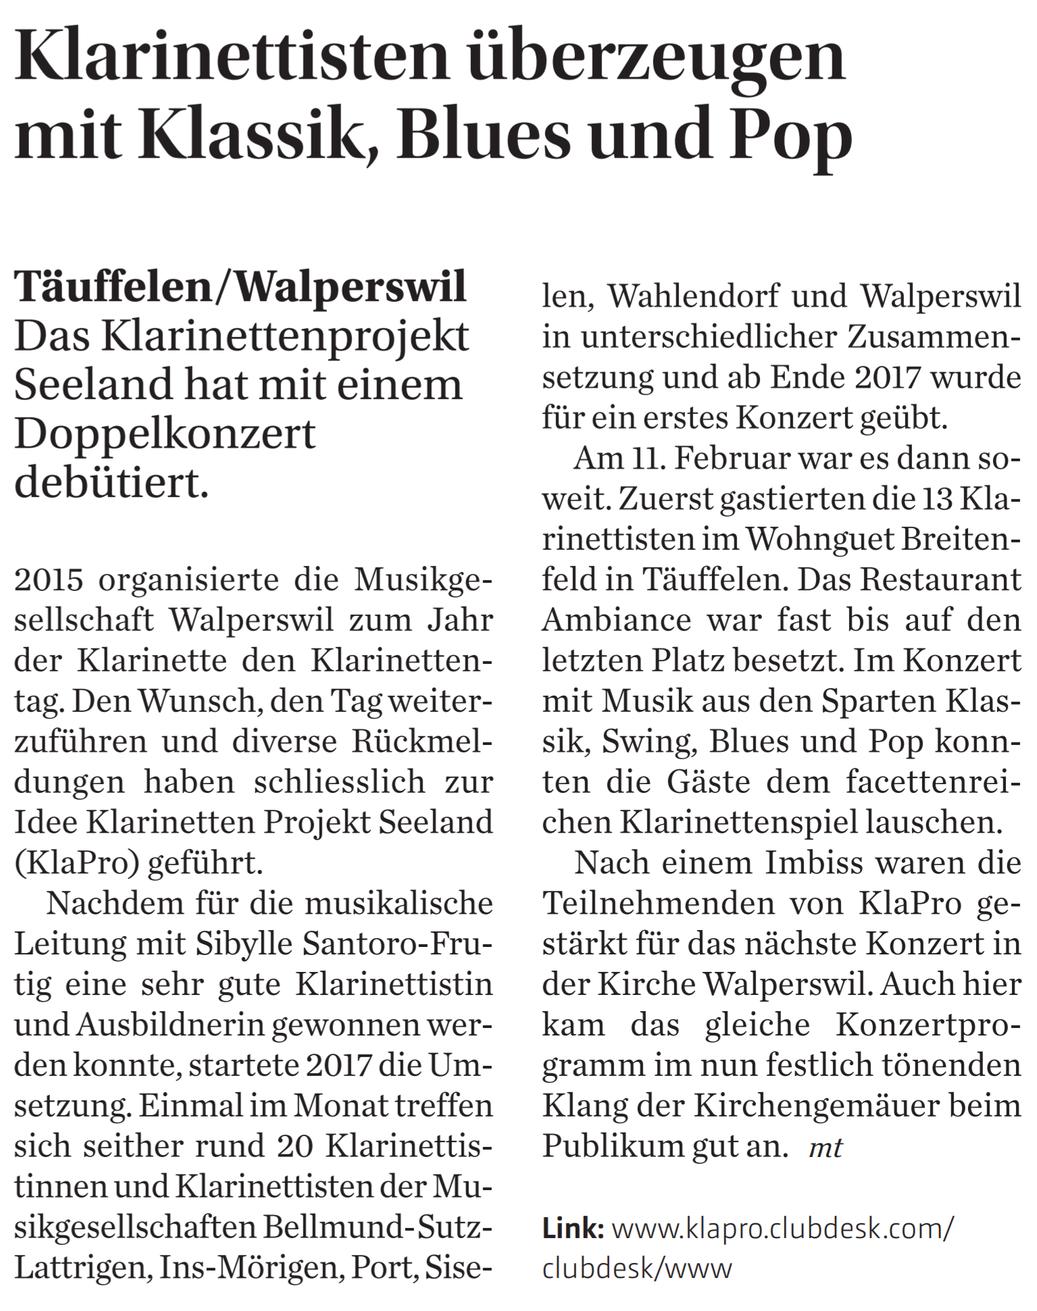 Bericht im Bieler Tagblatt vom 20.02.2018